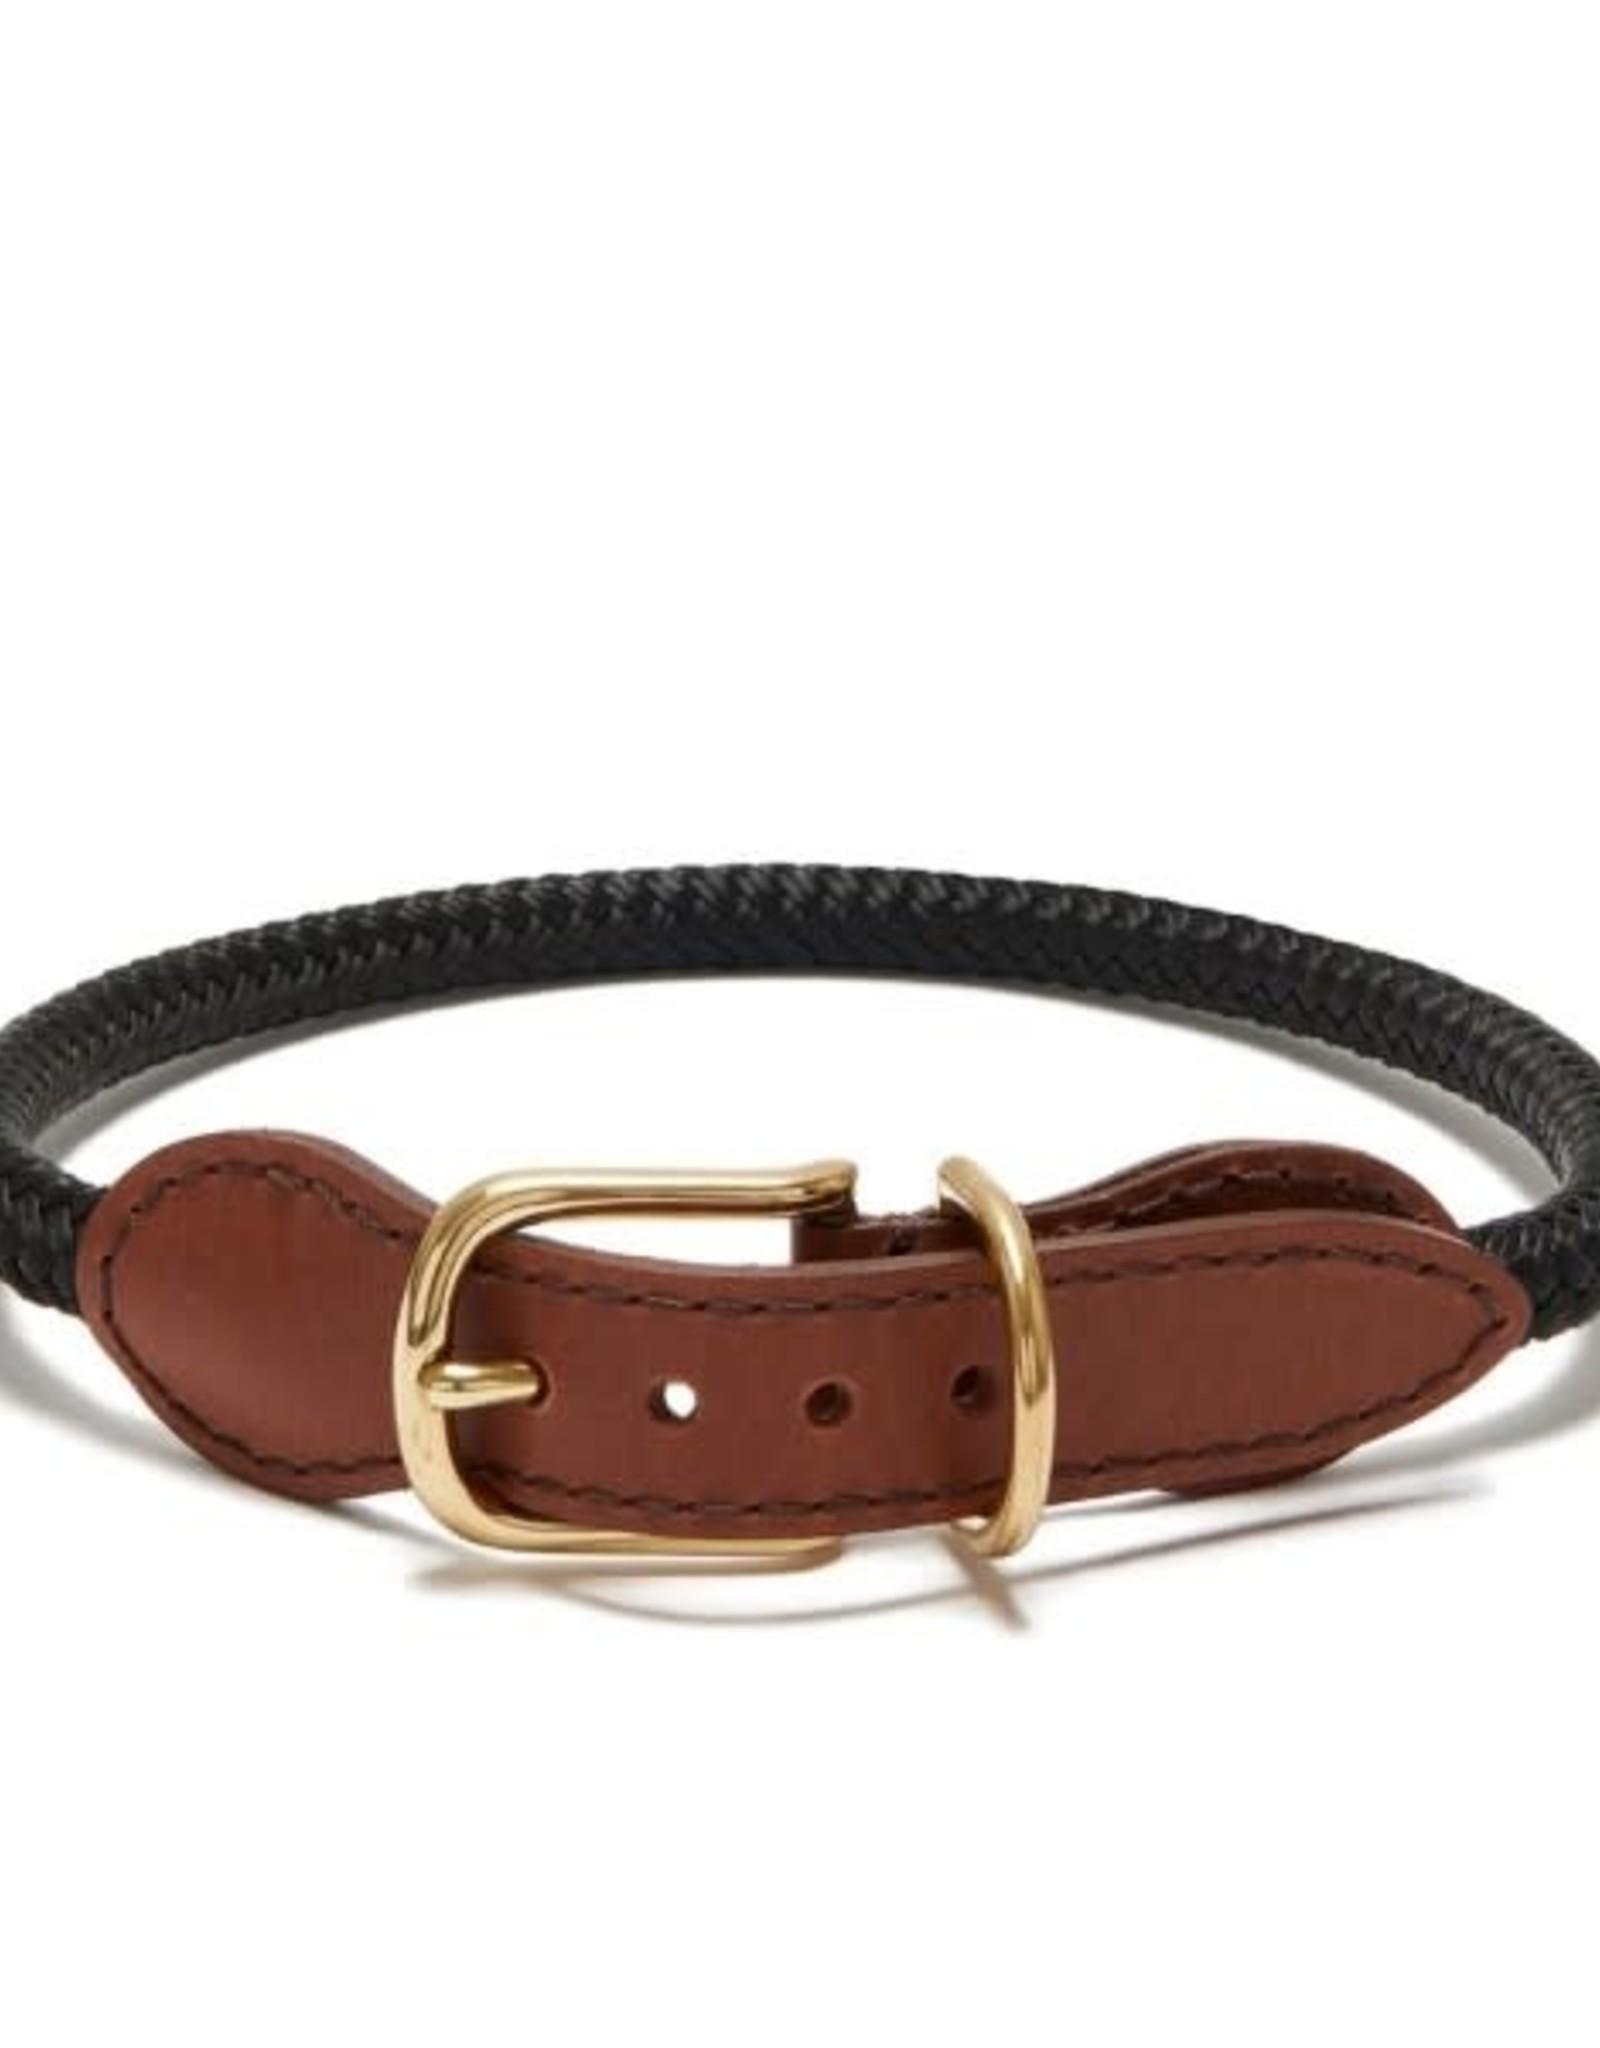 Knotty Adjustable Rope Collar - Black - Medium